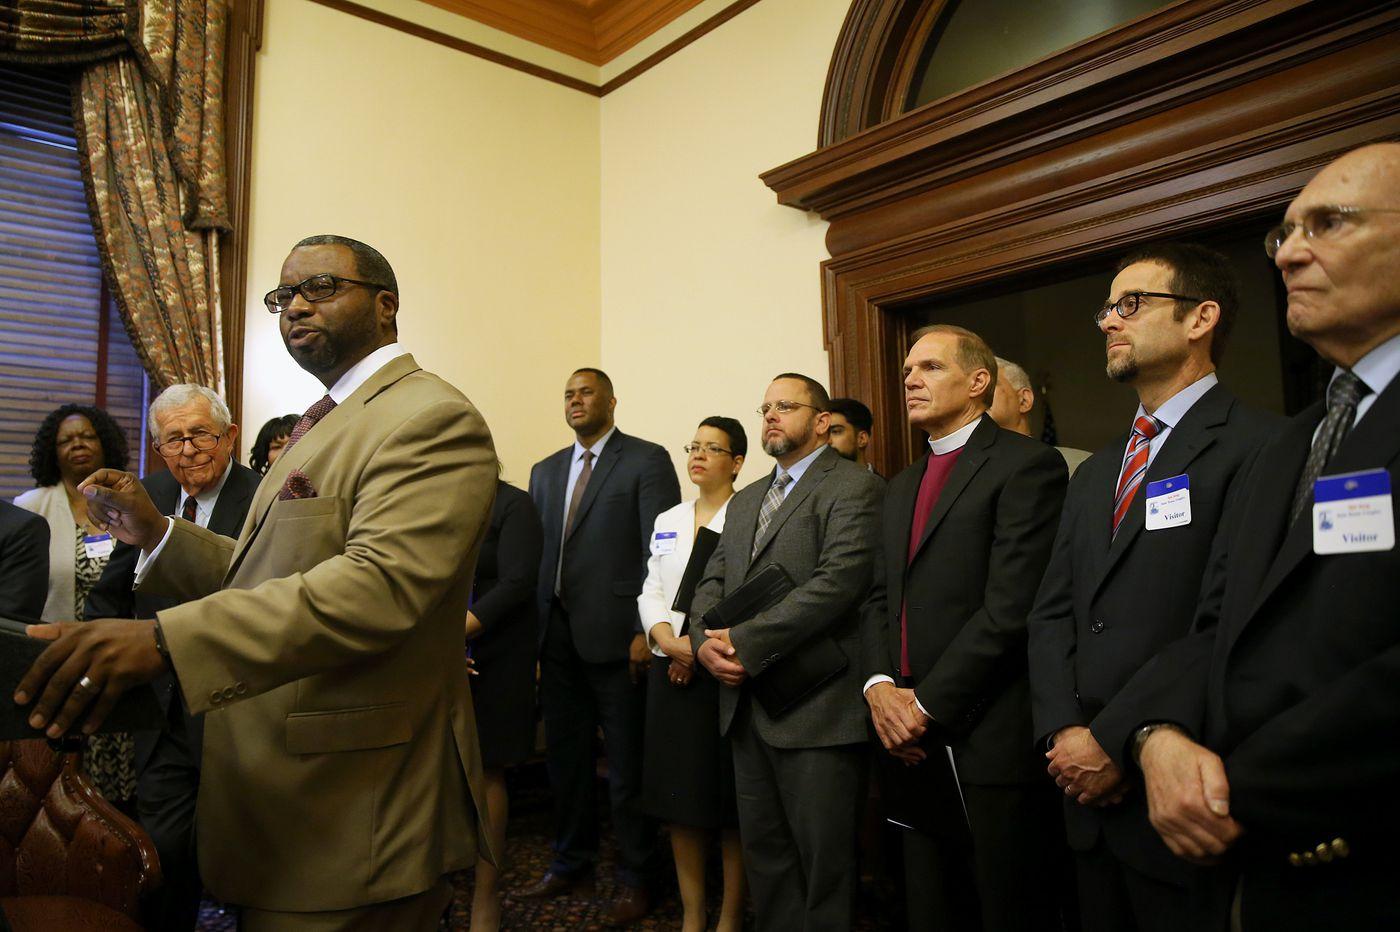 Despite N.J. school segregation, most residents don't see a problem, poll finds